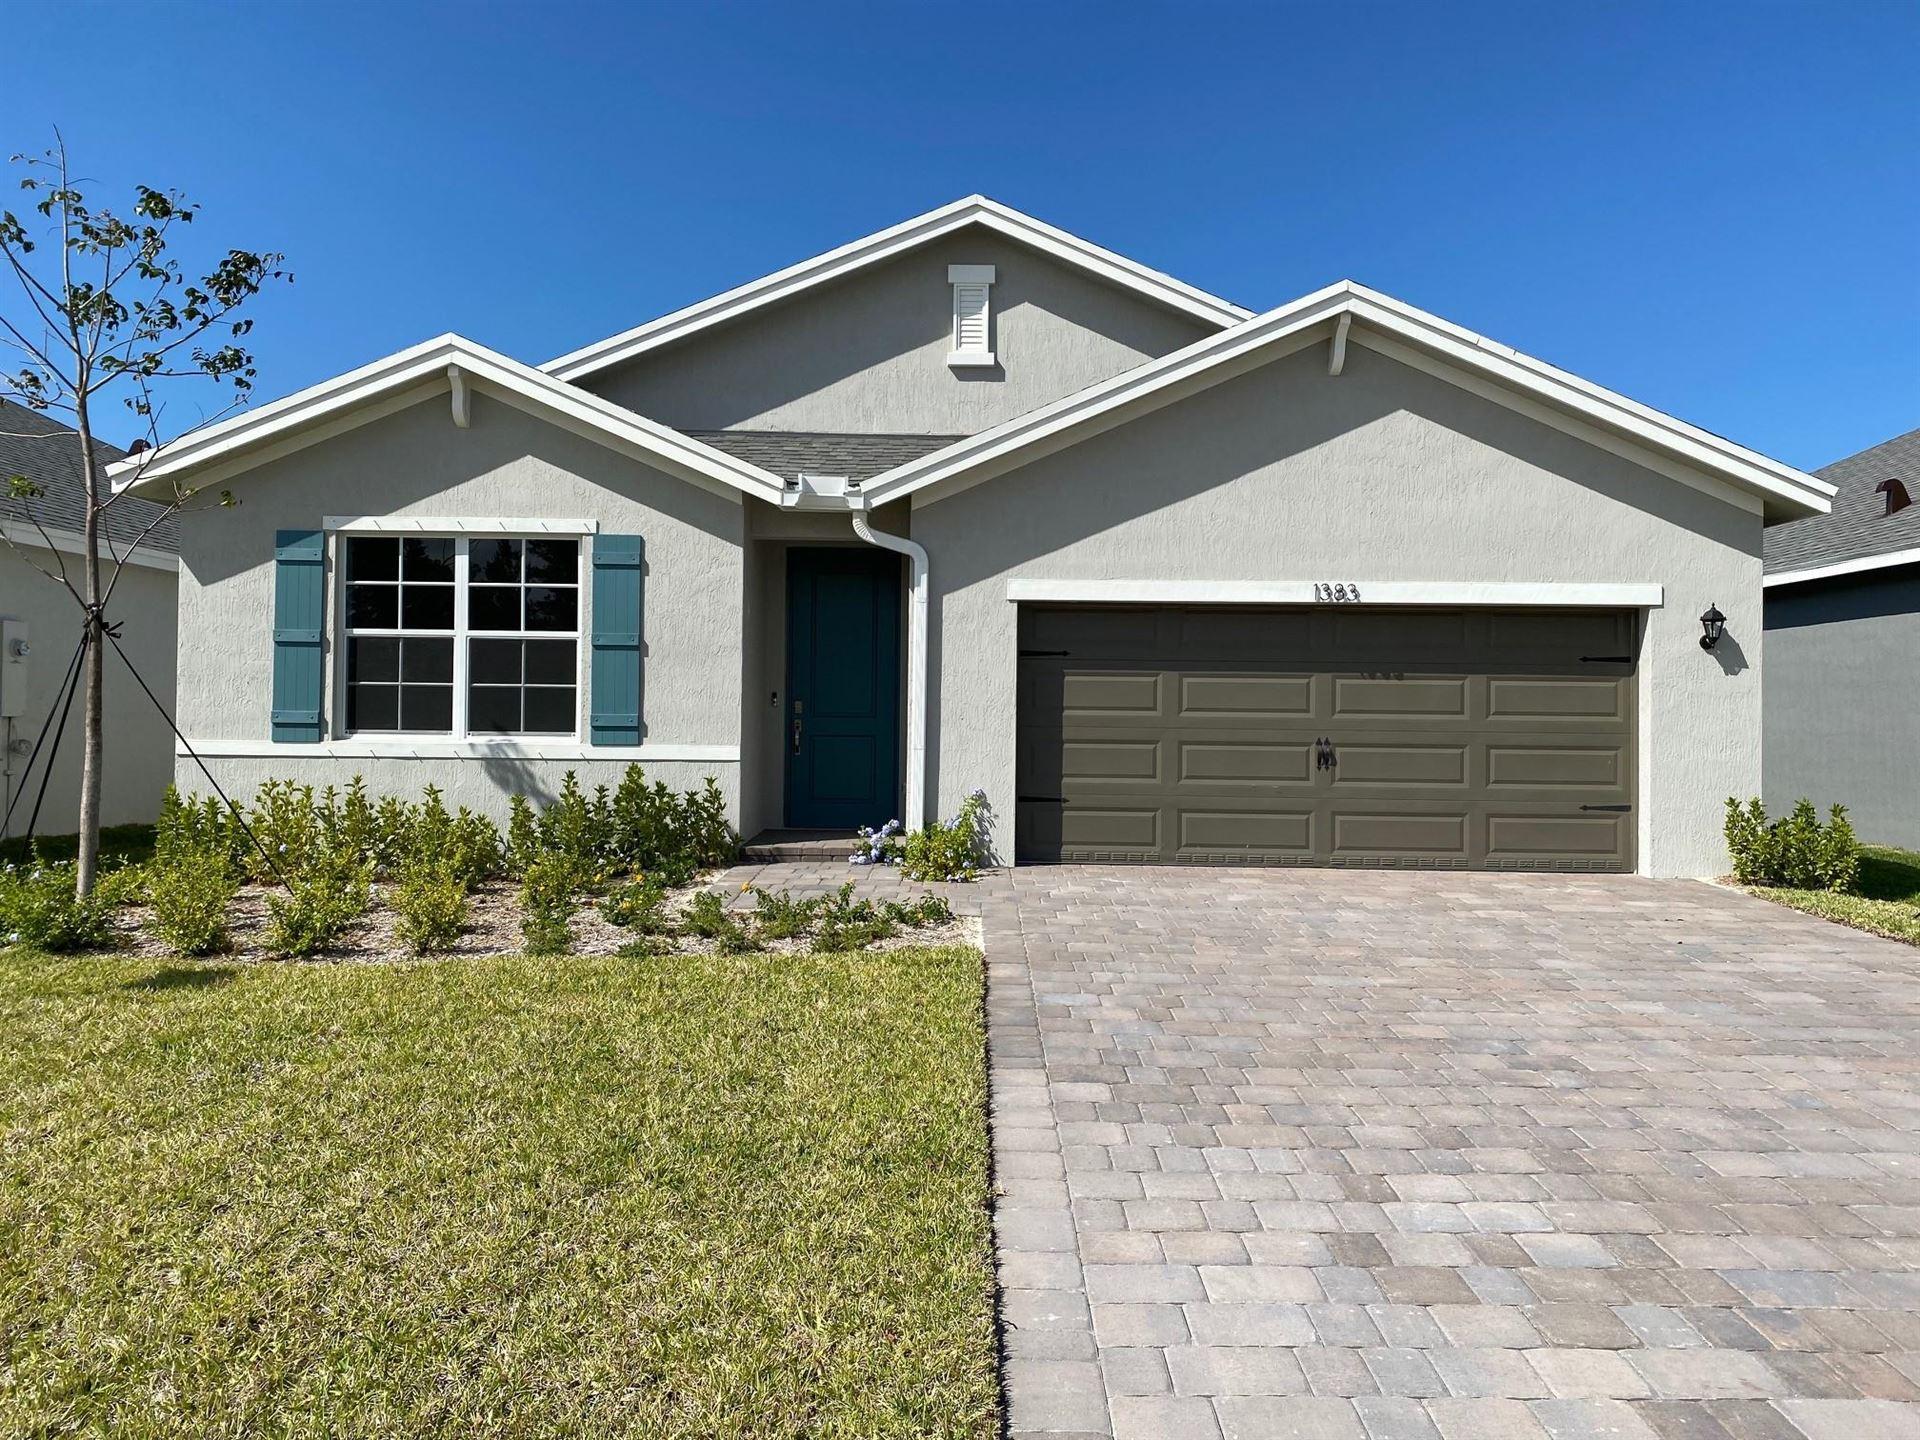 1383 NE White Pine Terrace, Jensen Beach, FL 34957 - #: RX-10613827